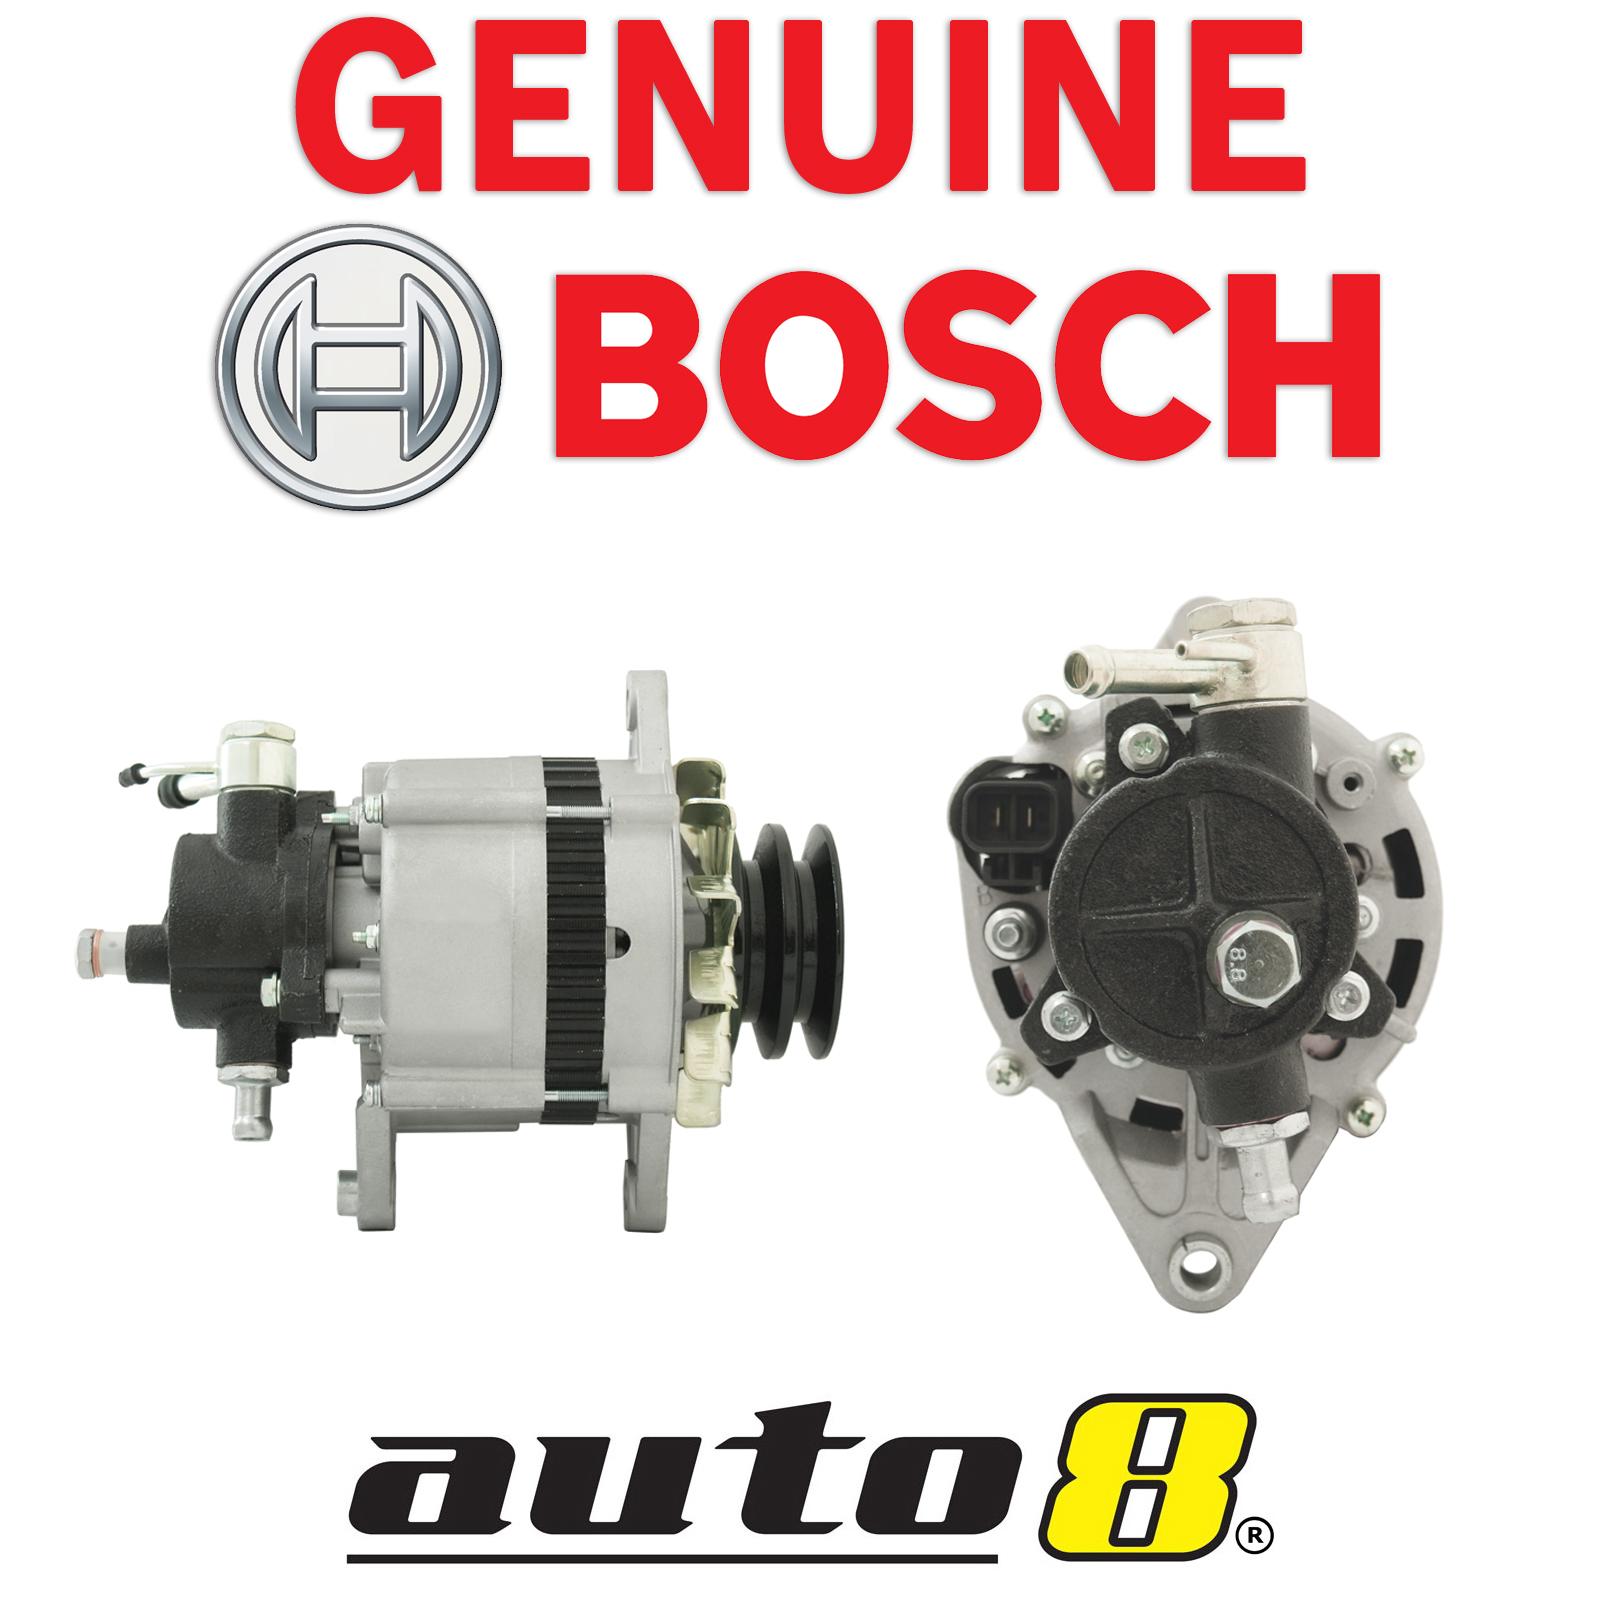 Details about Genuine Bosch Alternator fits Nissan Urvan E24 Diesel 2 7L  TD27 1986 - 1993